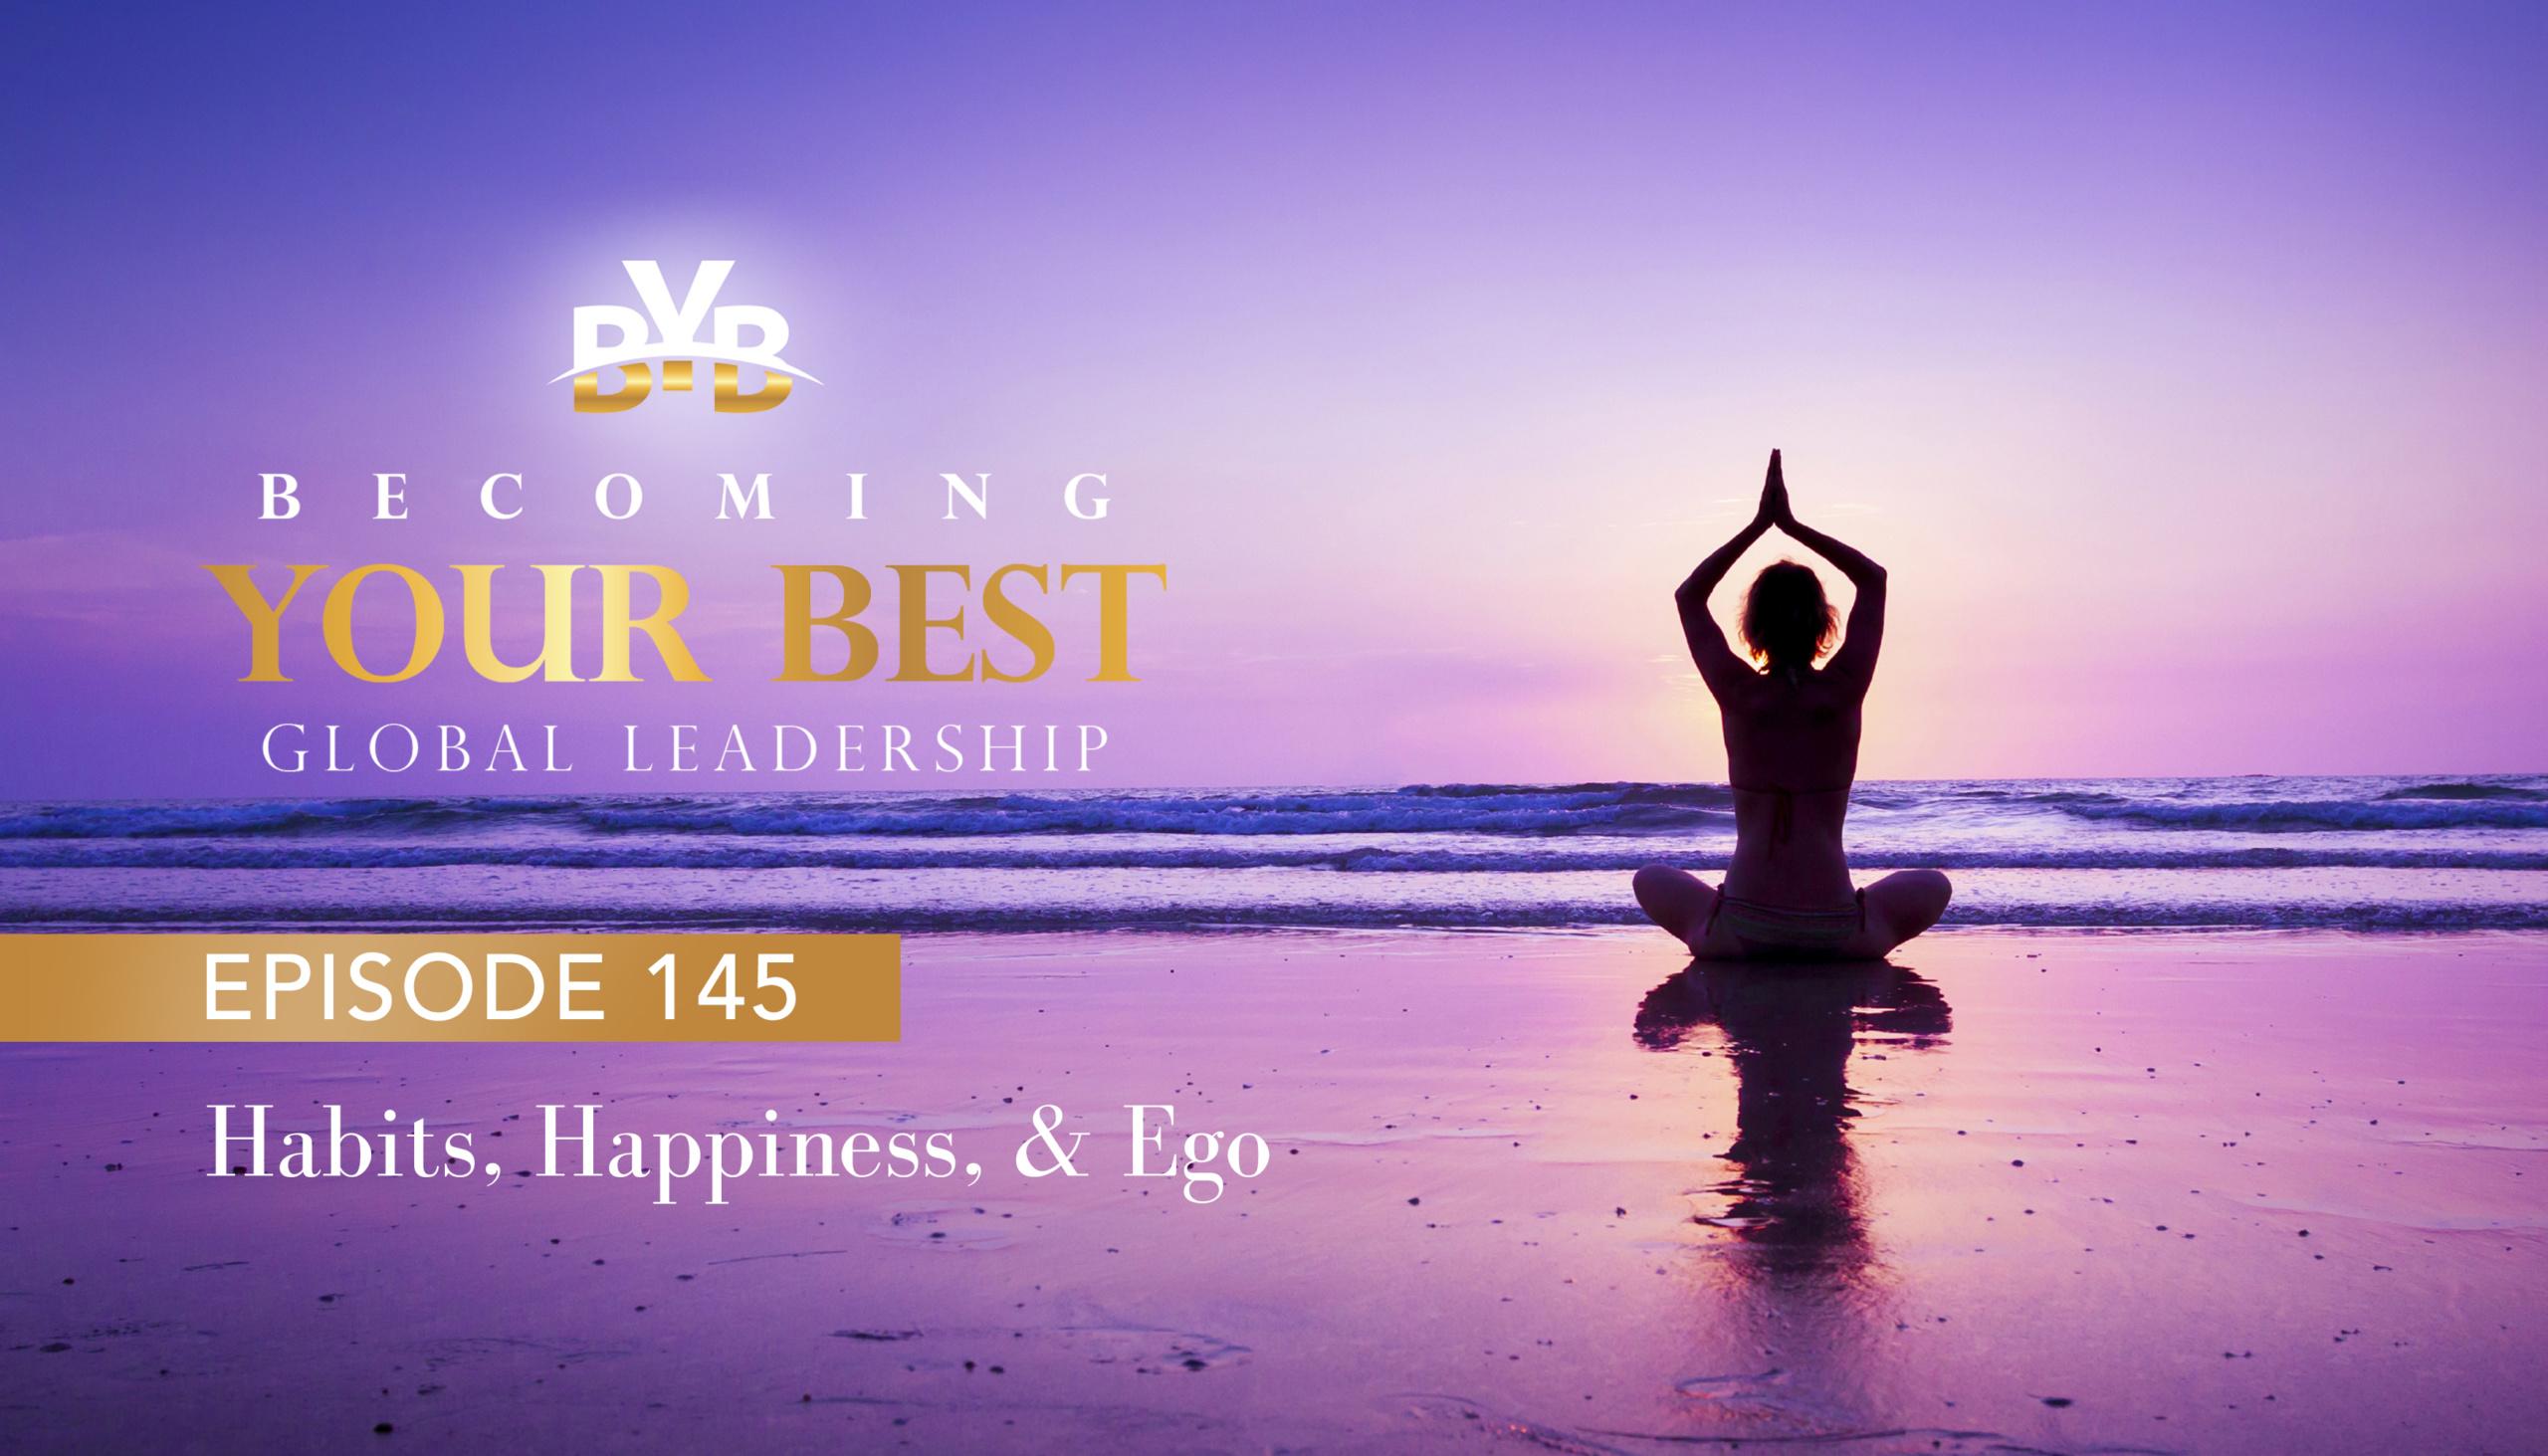 Episode 145 – Habits, Happiness & Ego